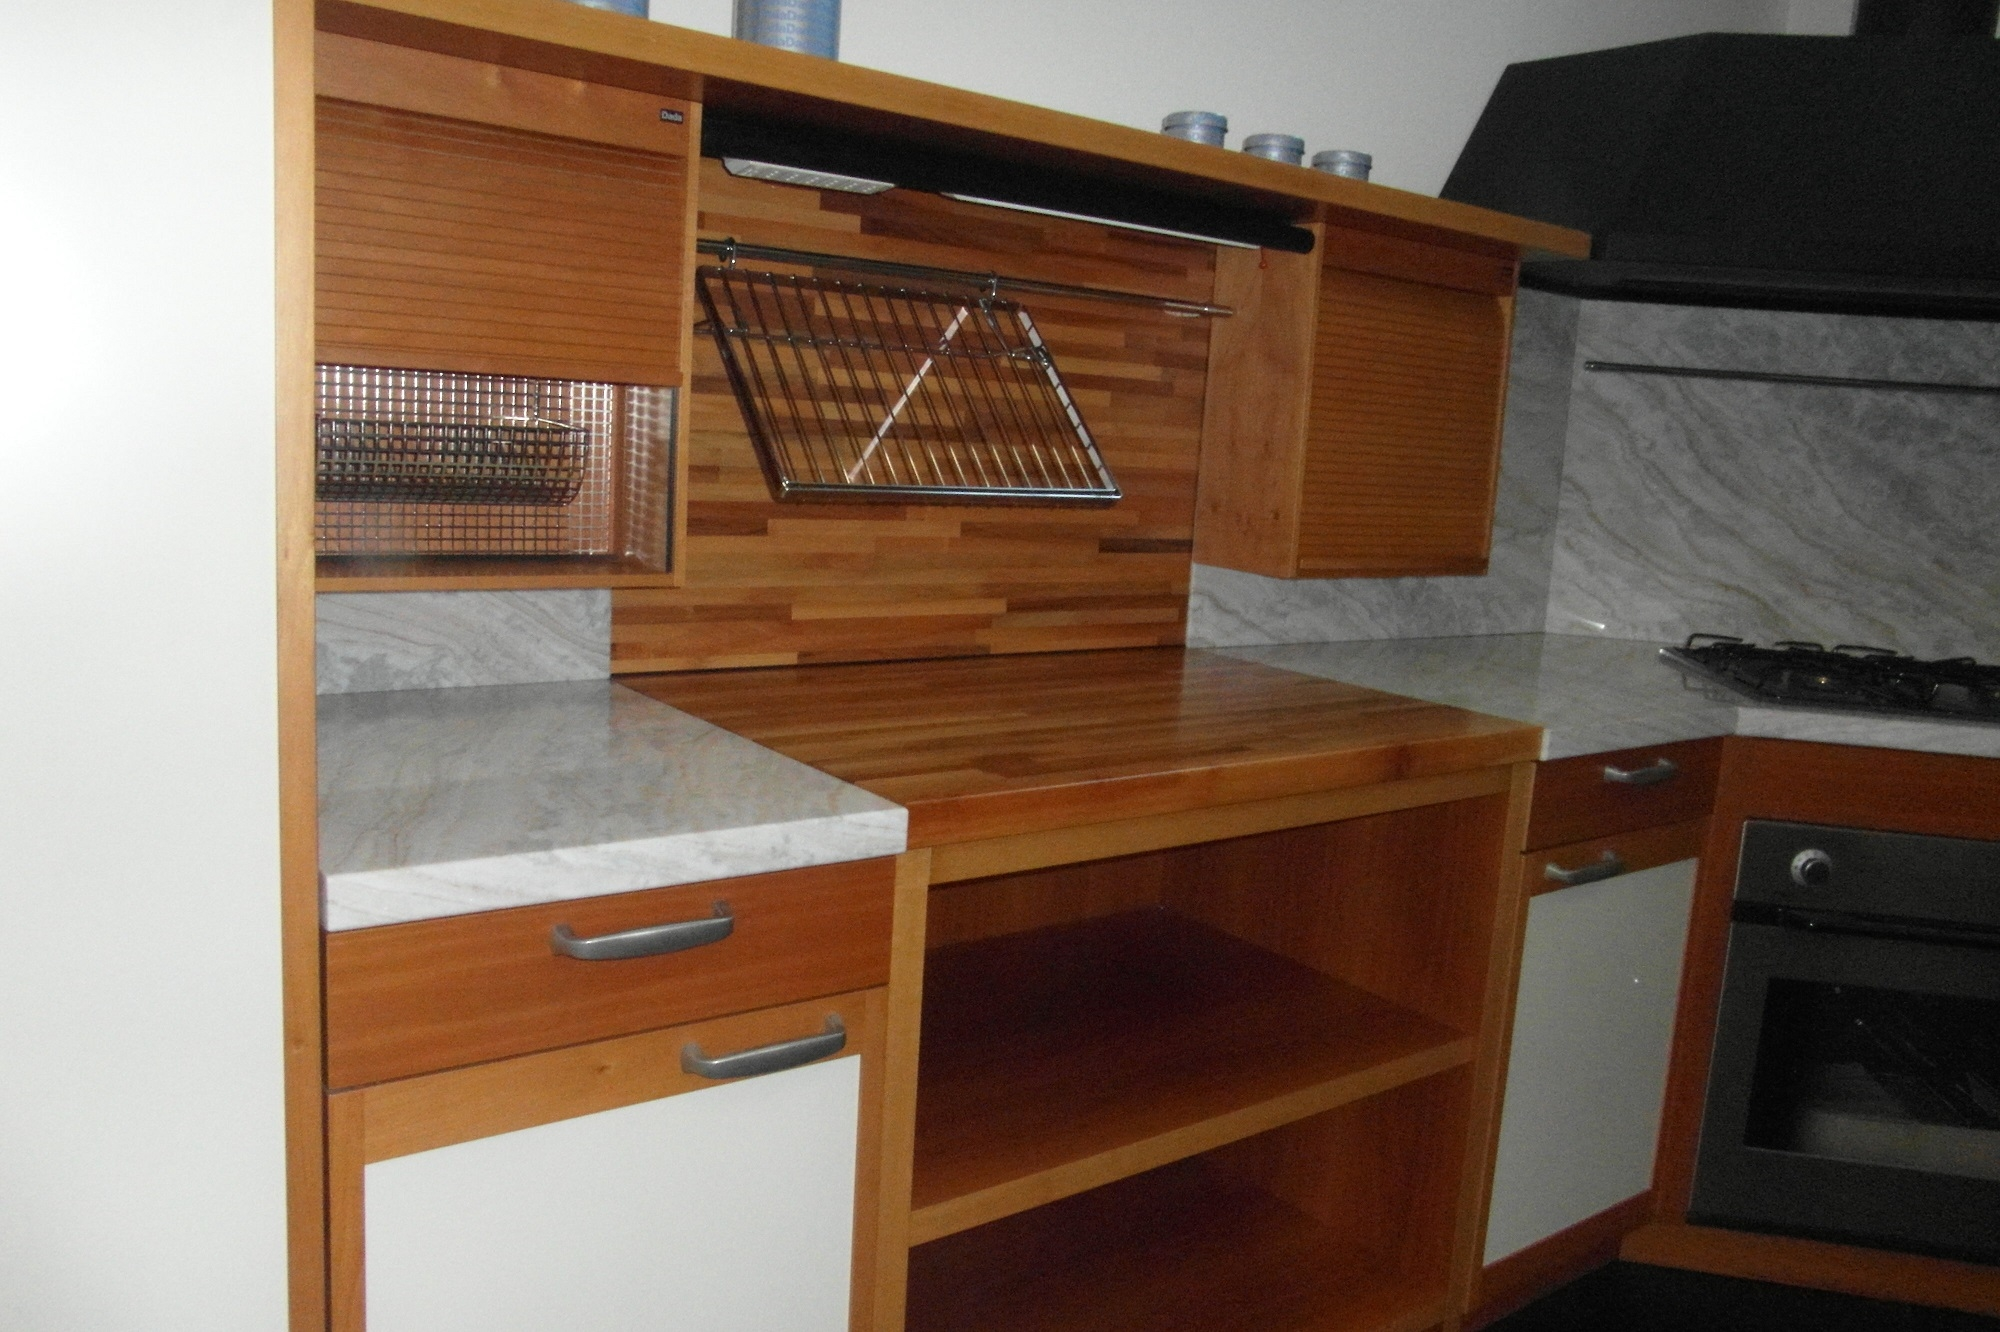 cucina dada in noce schienale e top in marmo karibib piano in lamellare di